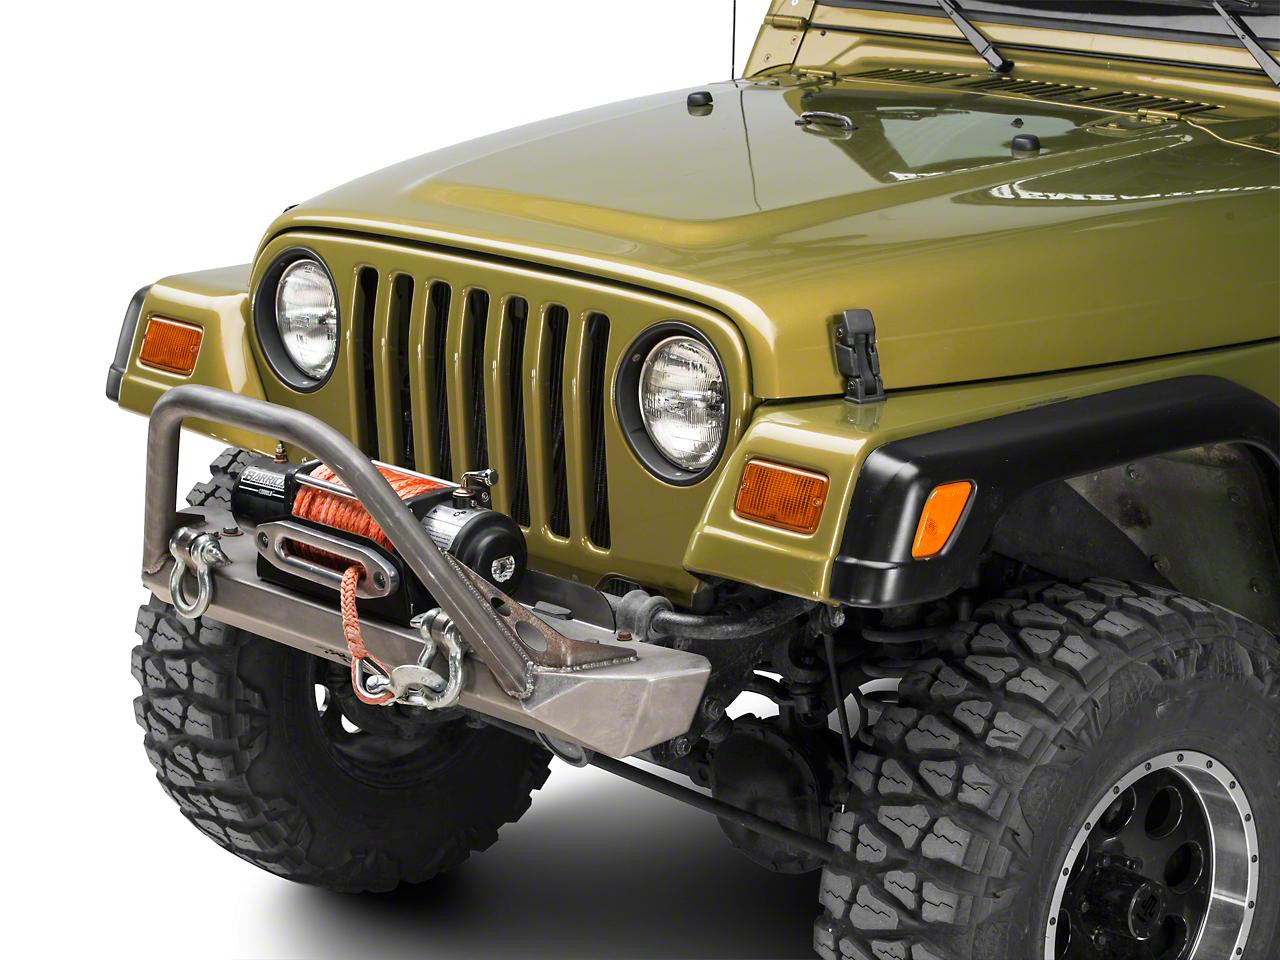 Poison Spyder RockBrawler Front MID Width Bumper w/ Brawler Bar & Shackle Tabs - Bare Steel (97-06 Jeep Wrangler TJ)